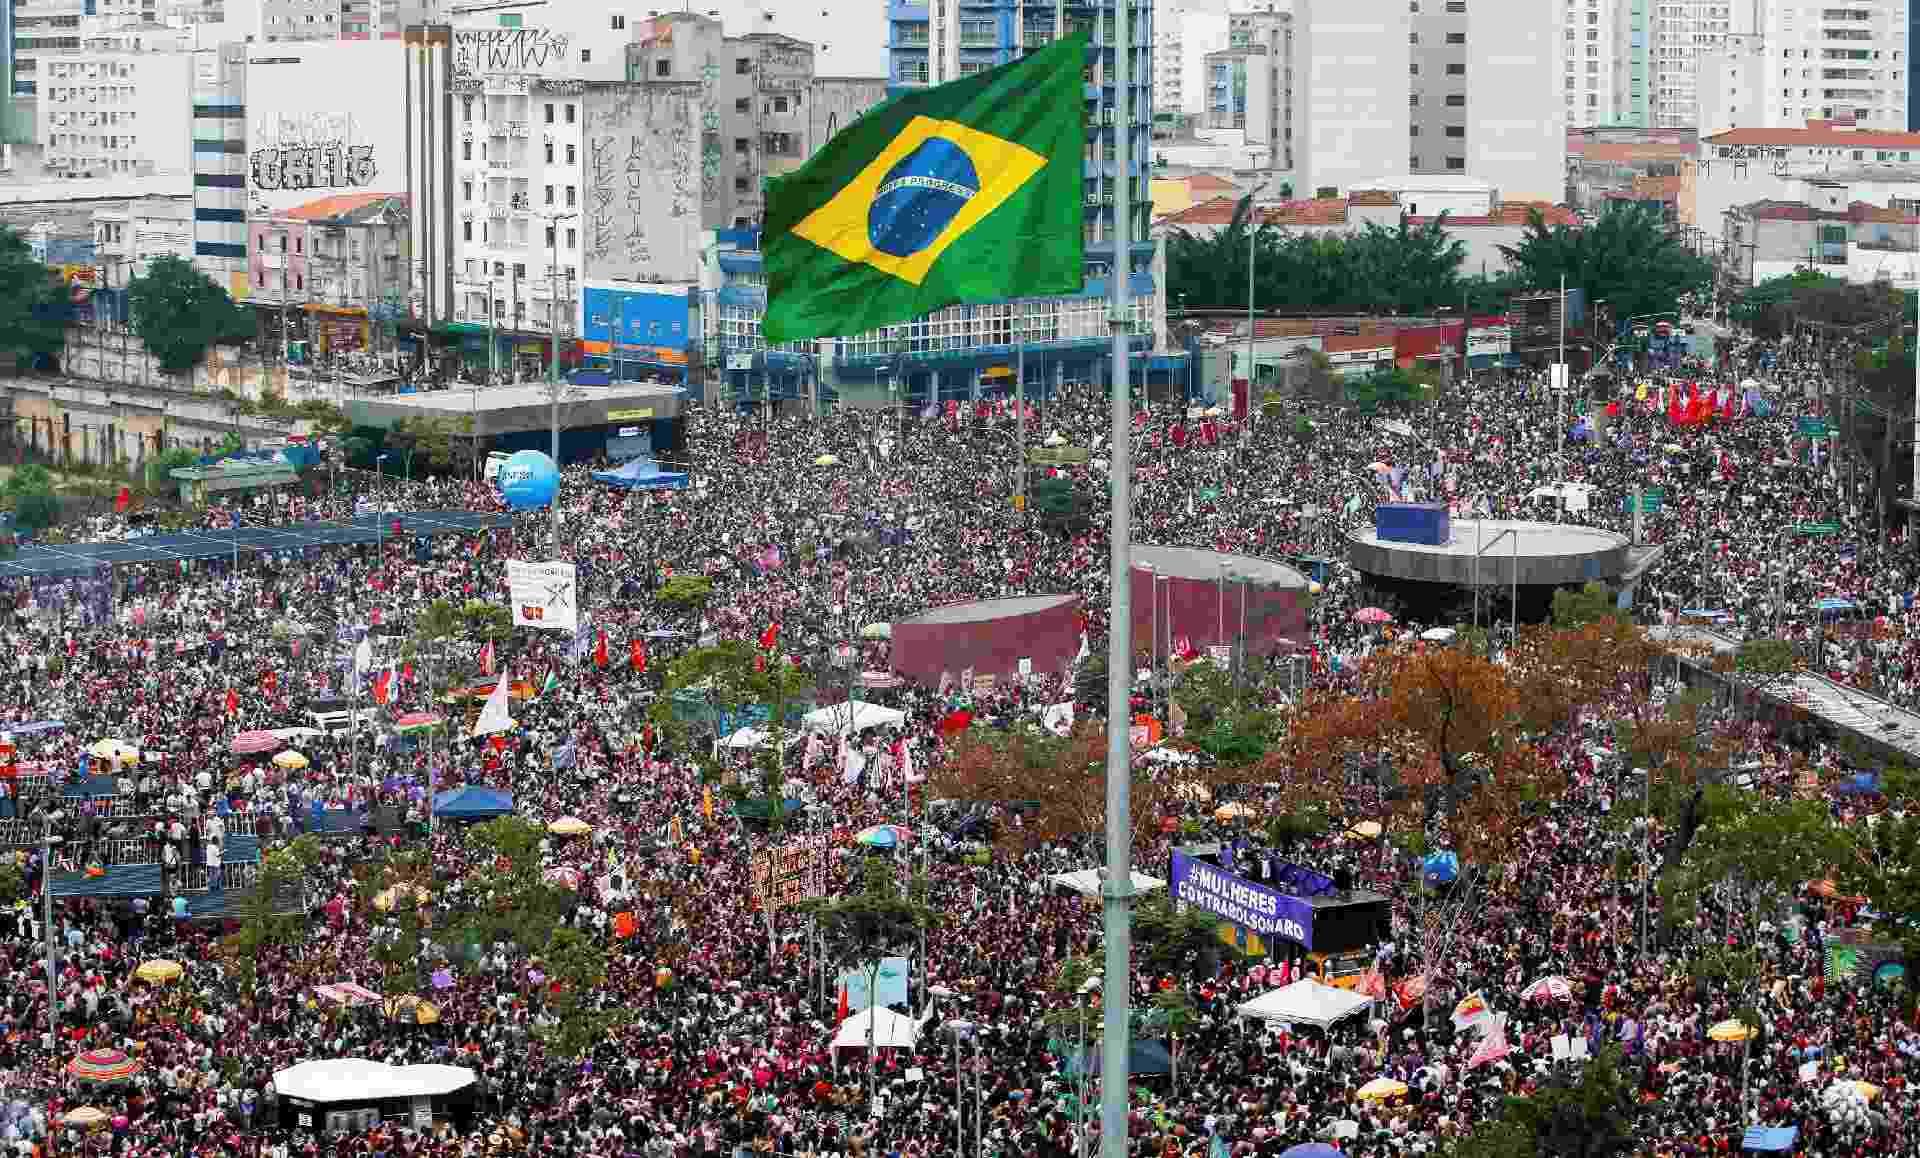 Protesto Largo da Batata - Reuters/Alexandre Schneider